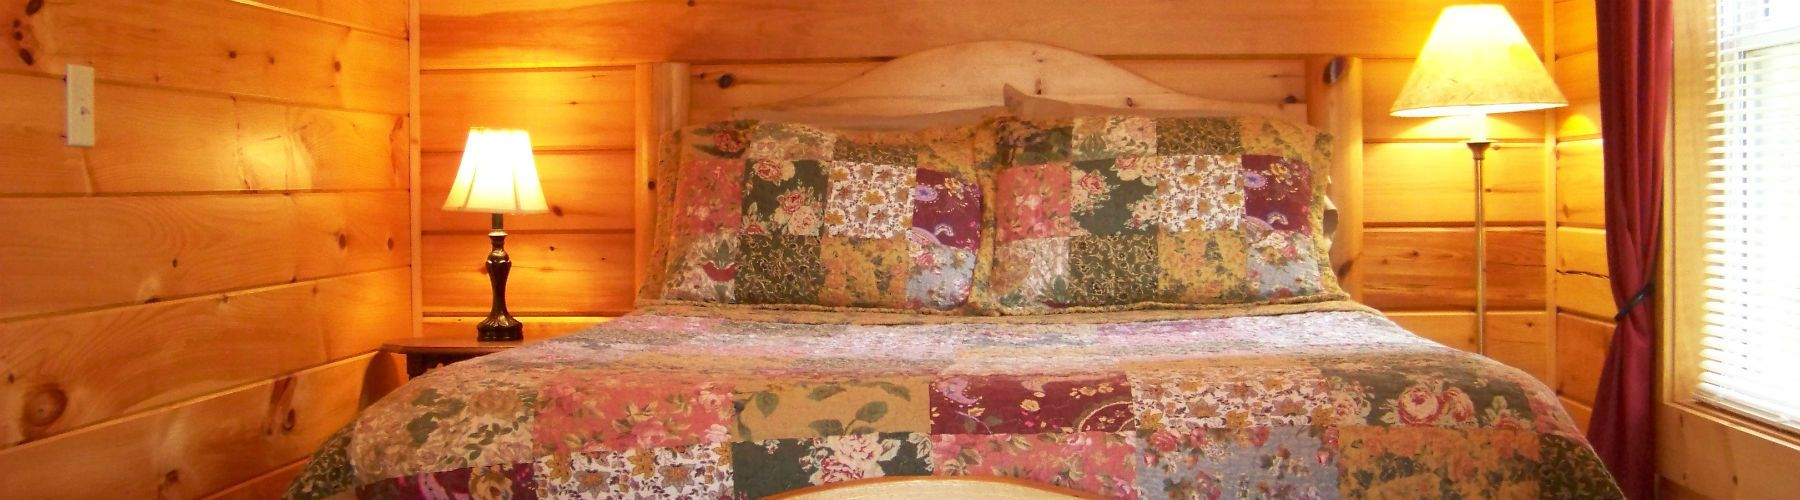 Log Cabin Bedroom Gill Ridge Log Cabin Bed Breakfast In Upper Meramec River Country